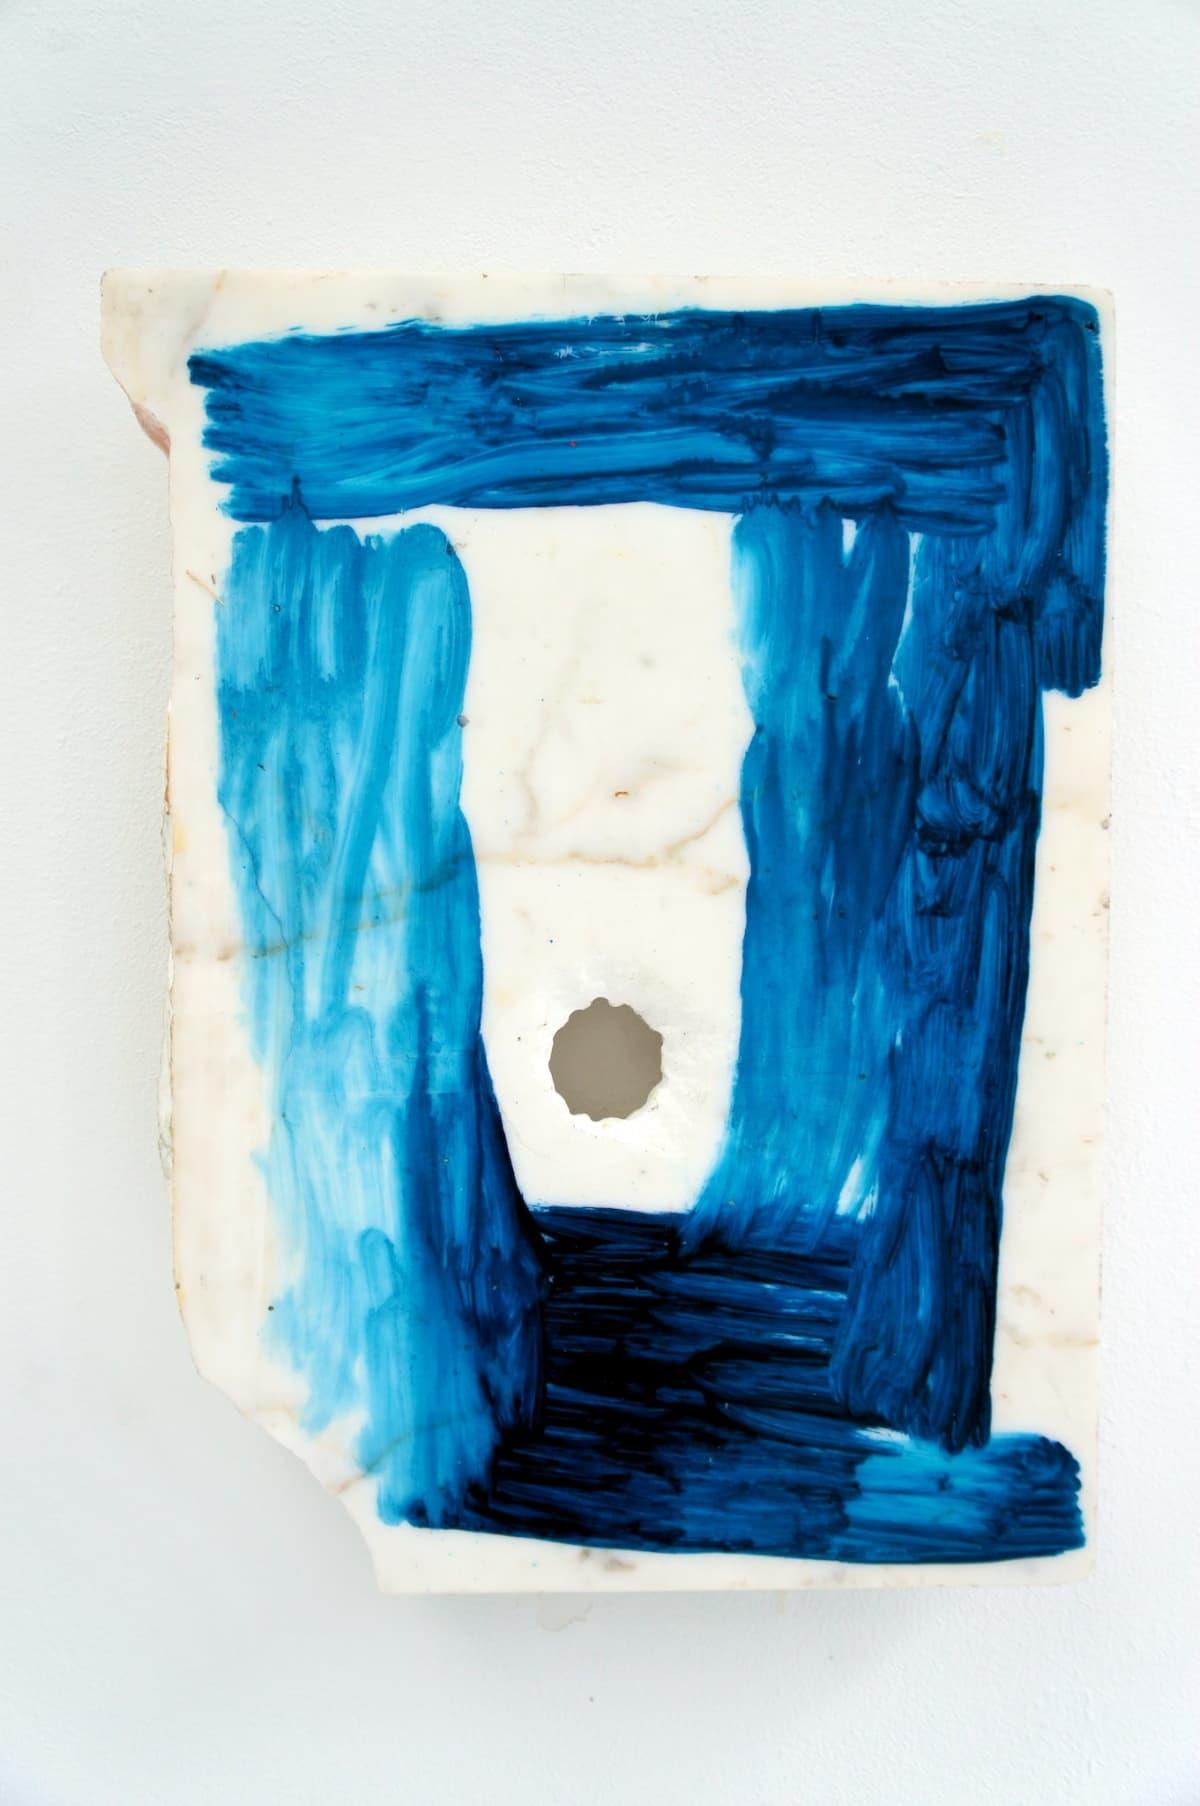 Mike Pratt, Sink, 2013